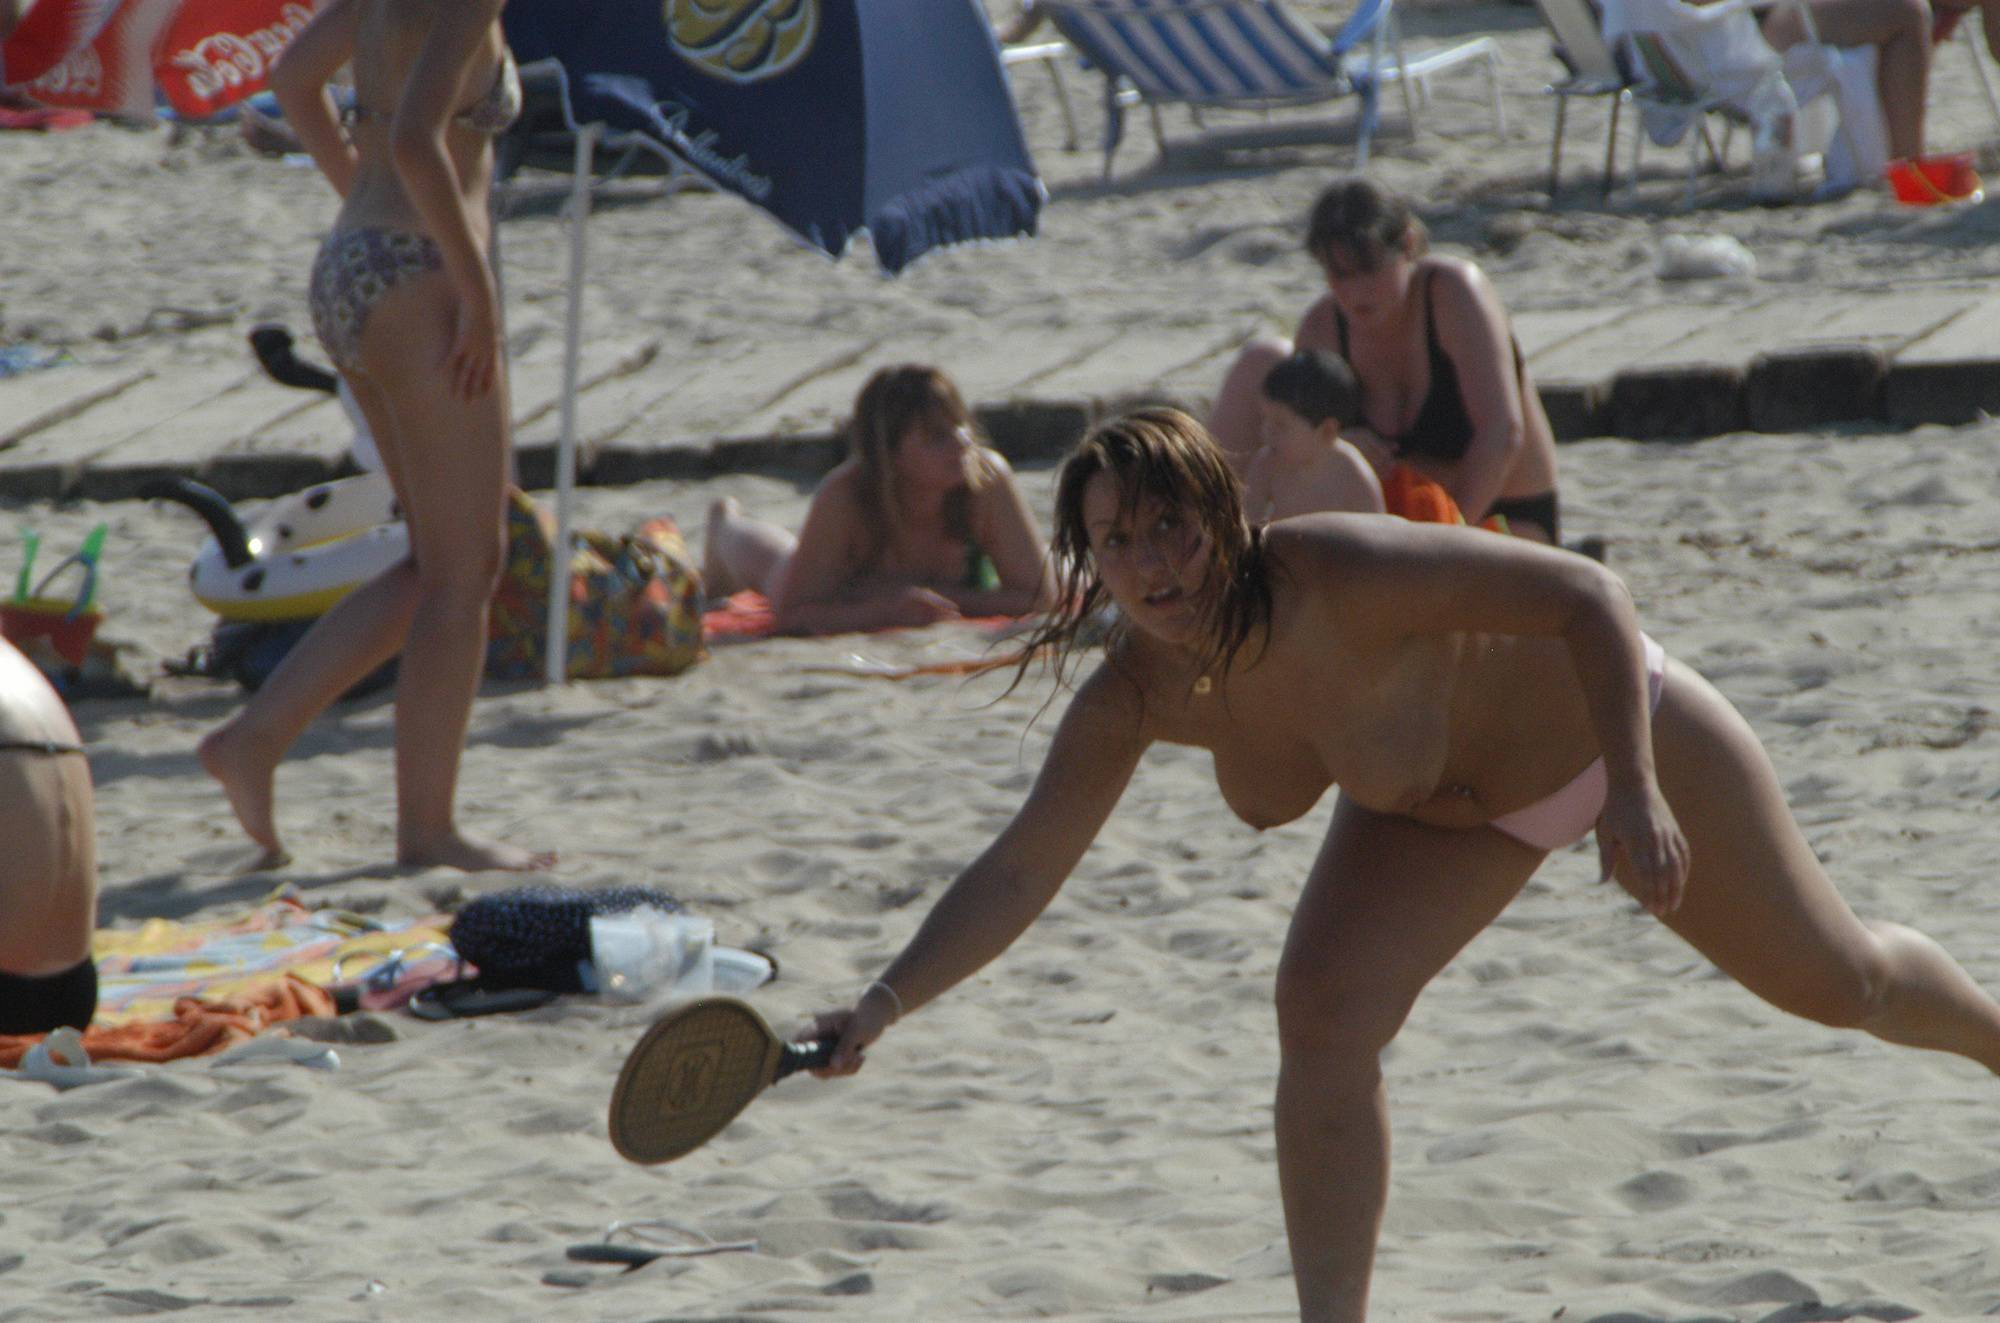 Nudist Pics Topless Water Recreation - 1